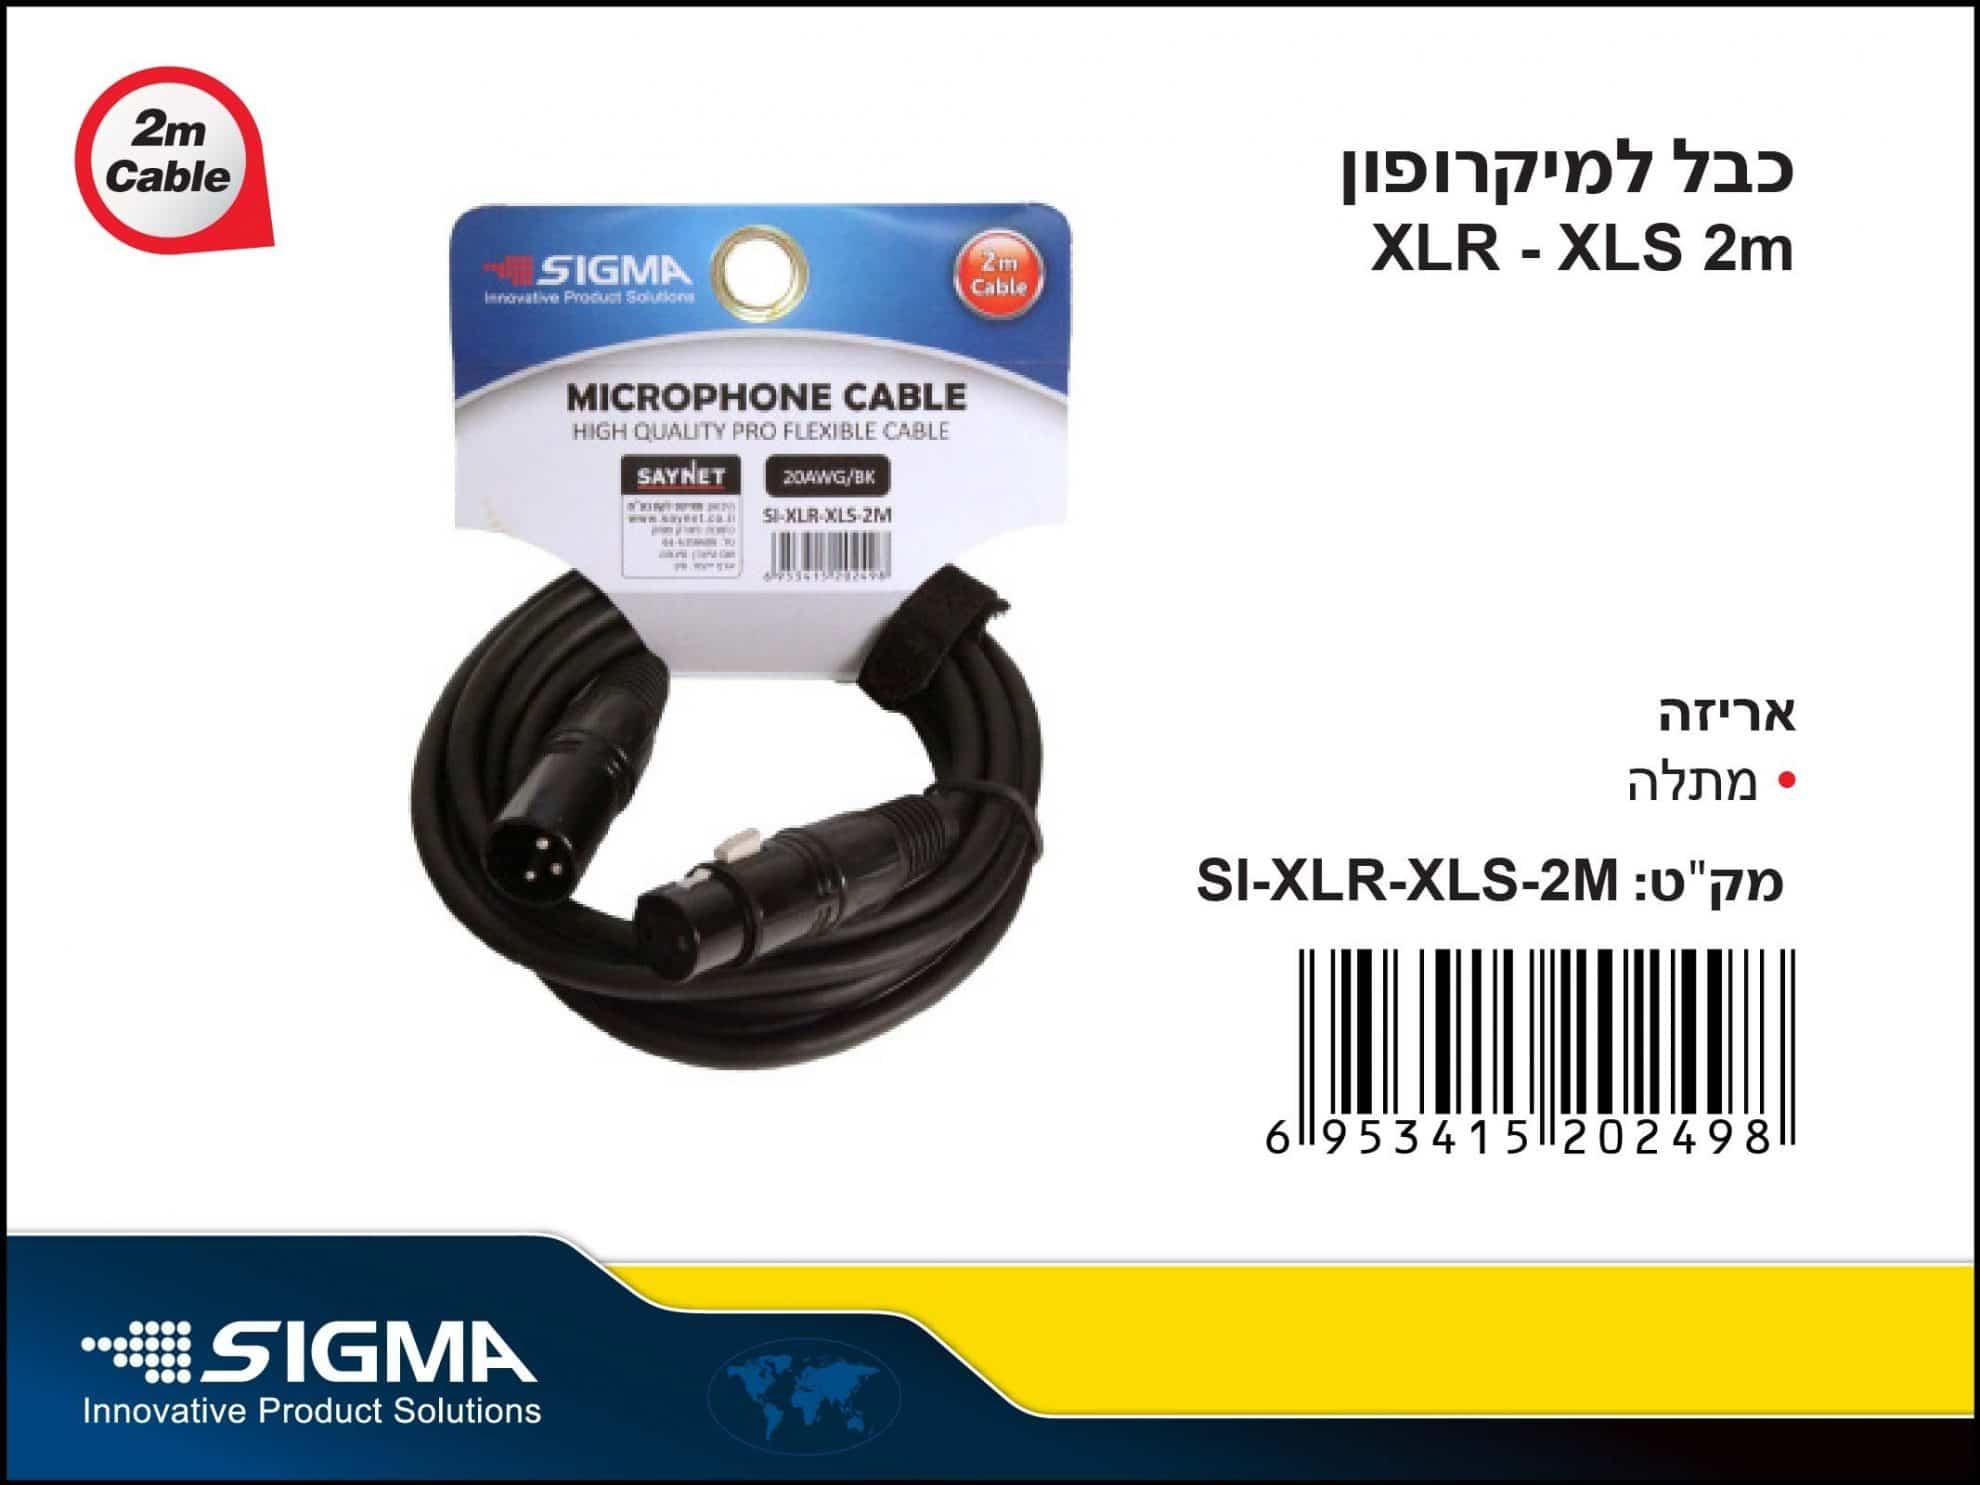 SIGMA במתלה XLR כבל למיקרופון 2 מטר